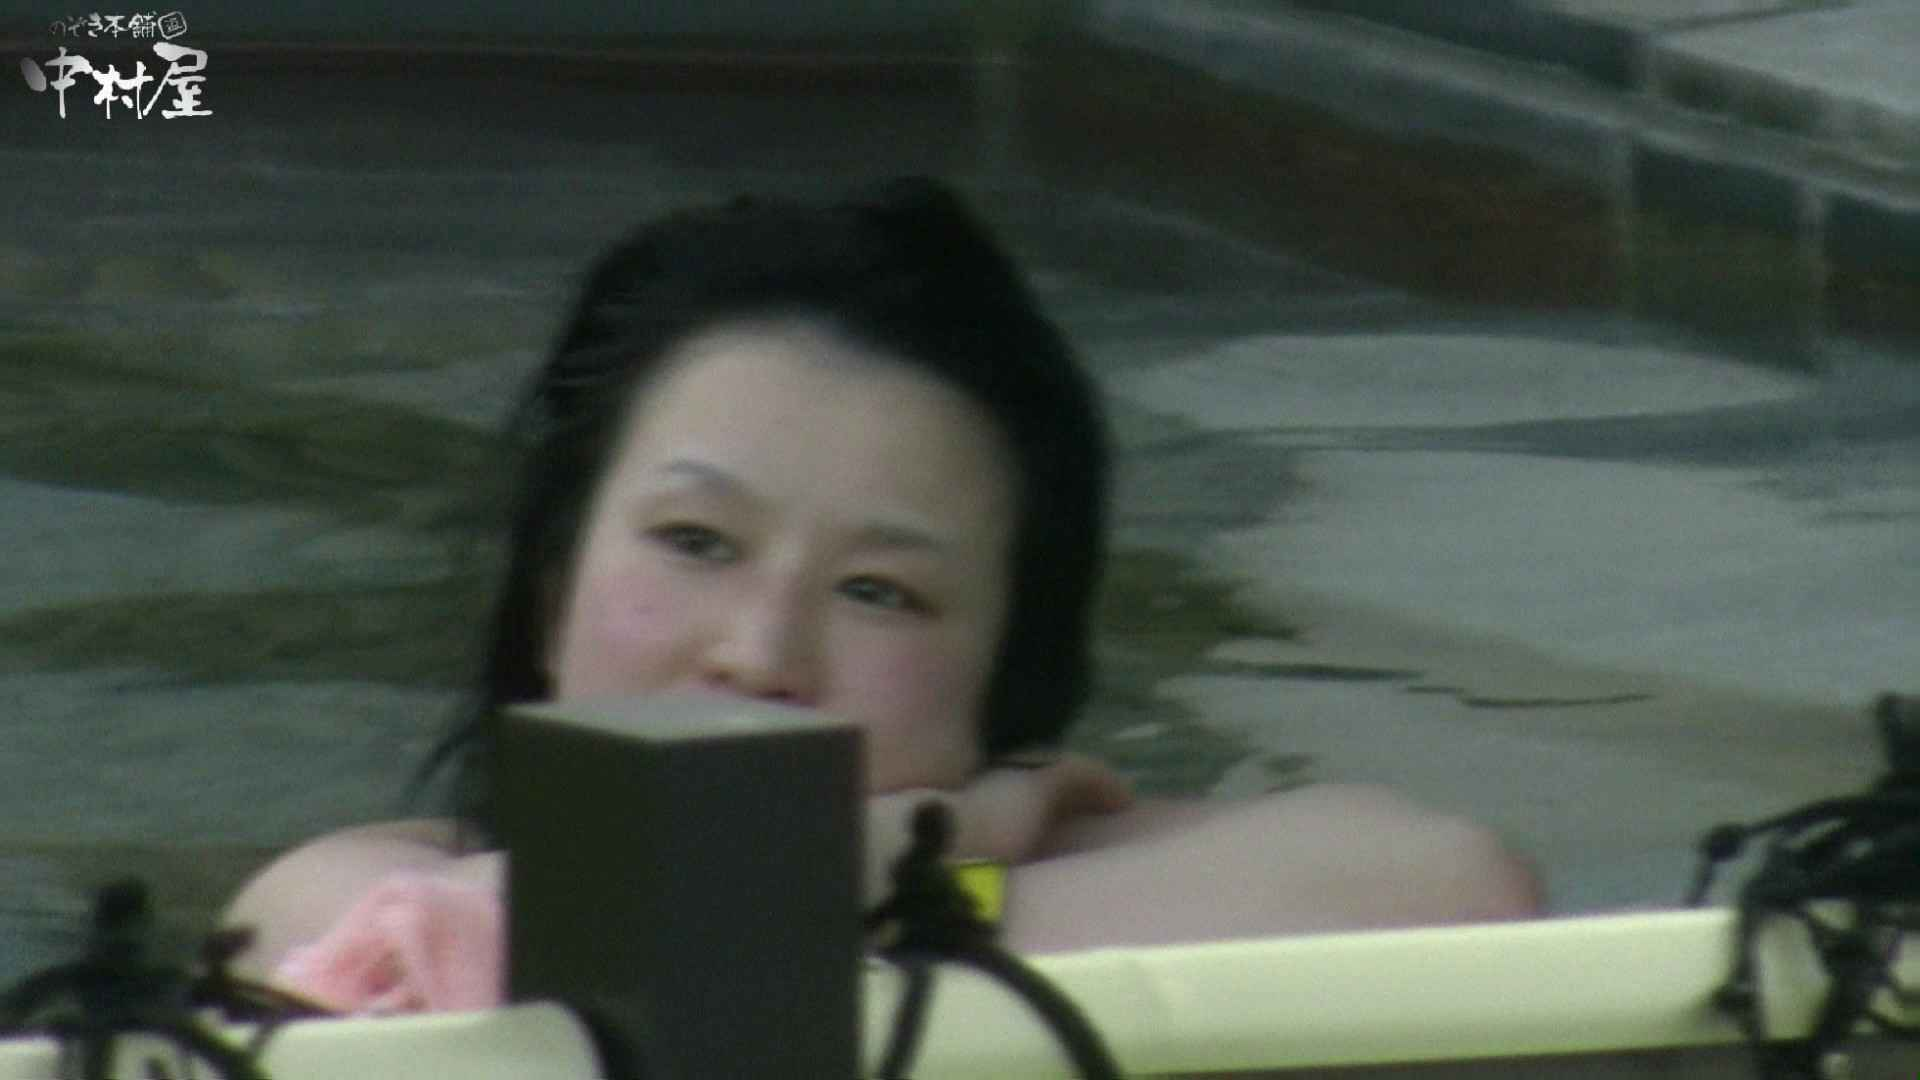 Aquaな露天風呂Vol.982 露天風呂突入 SEX無修正画像 78pic 56